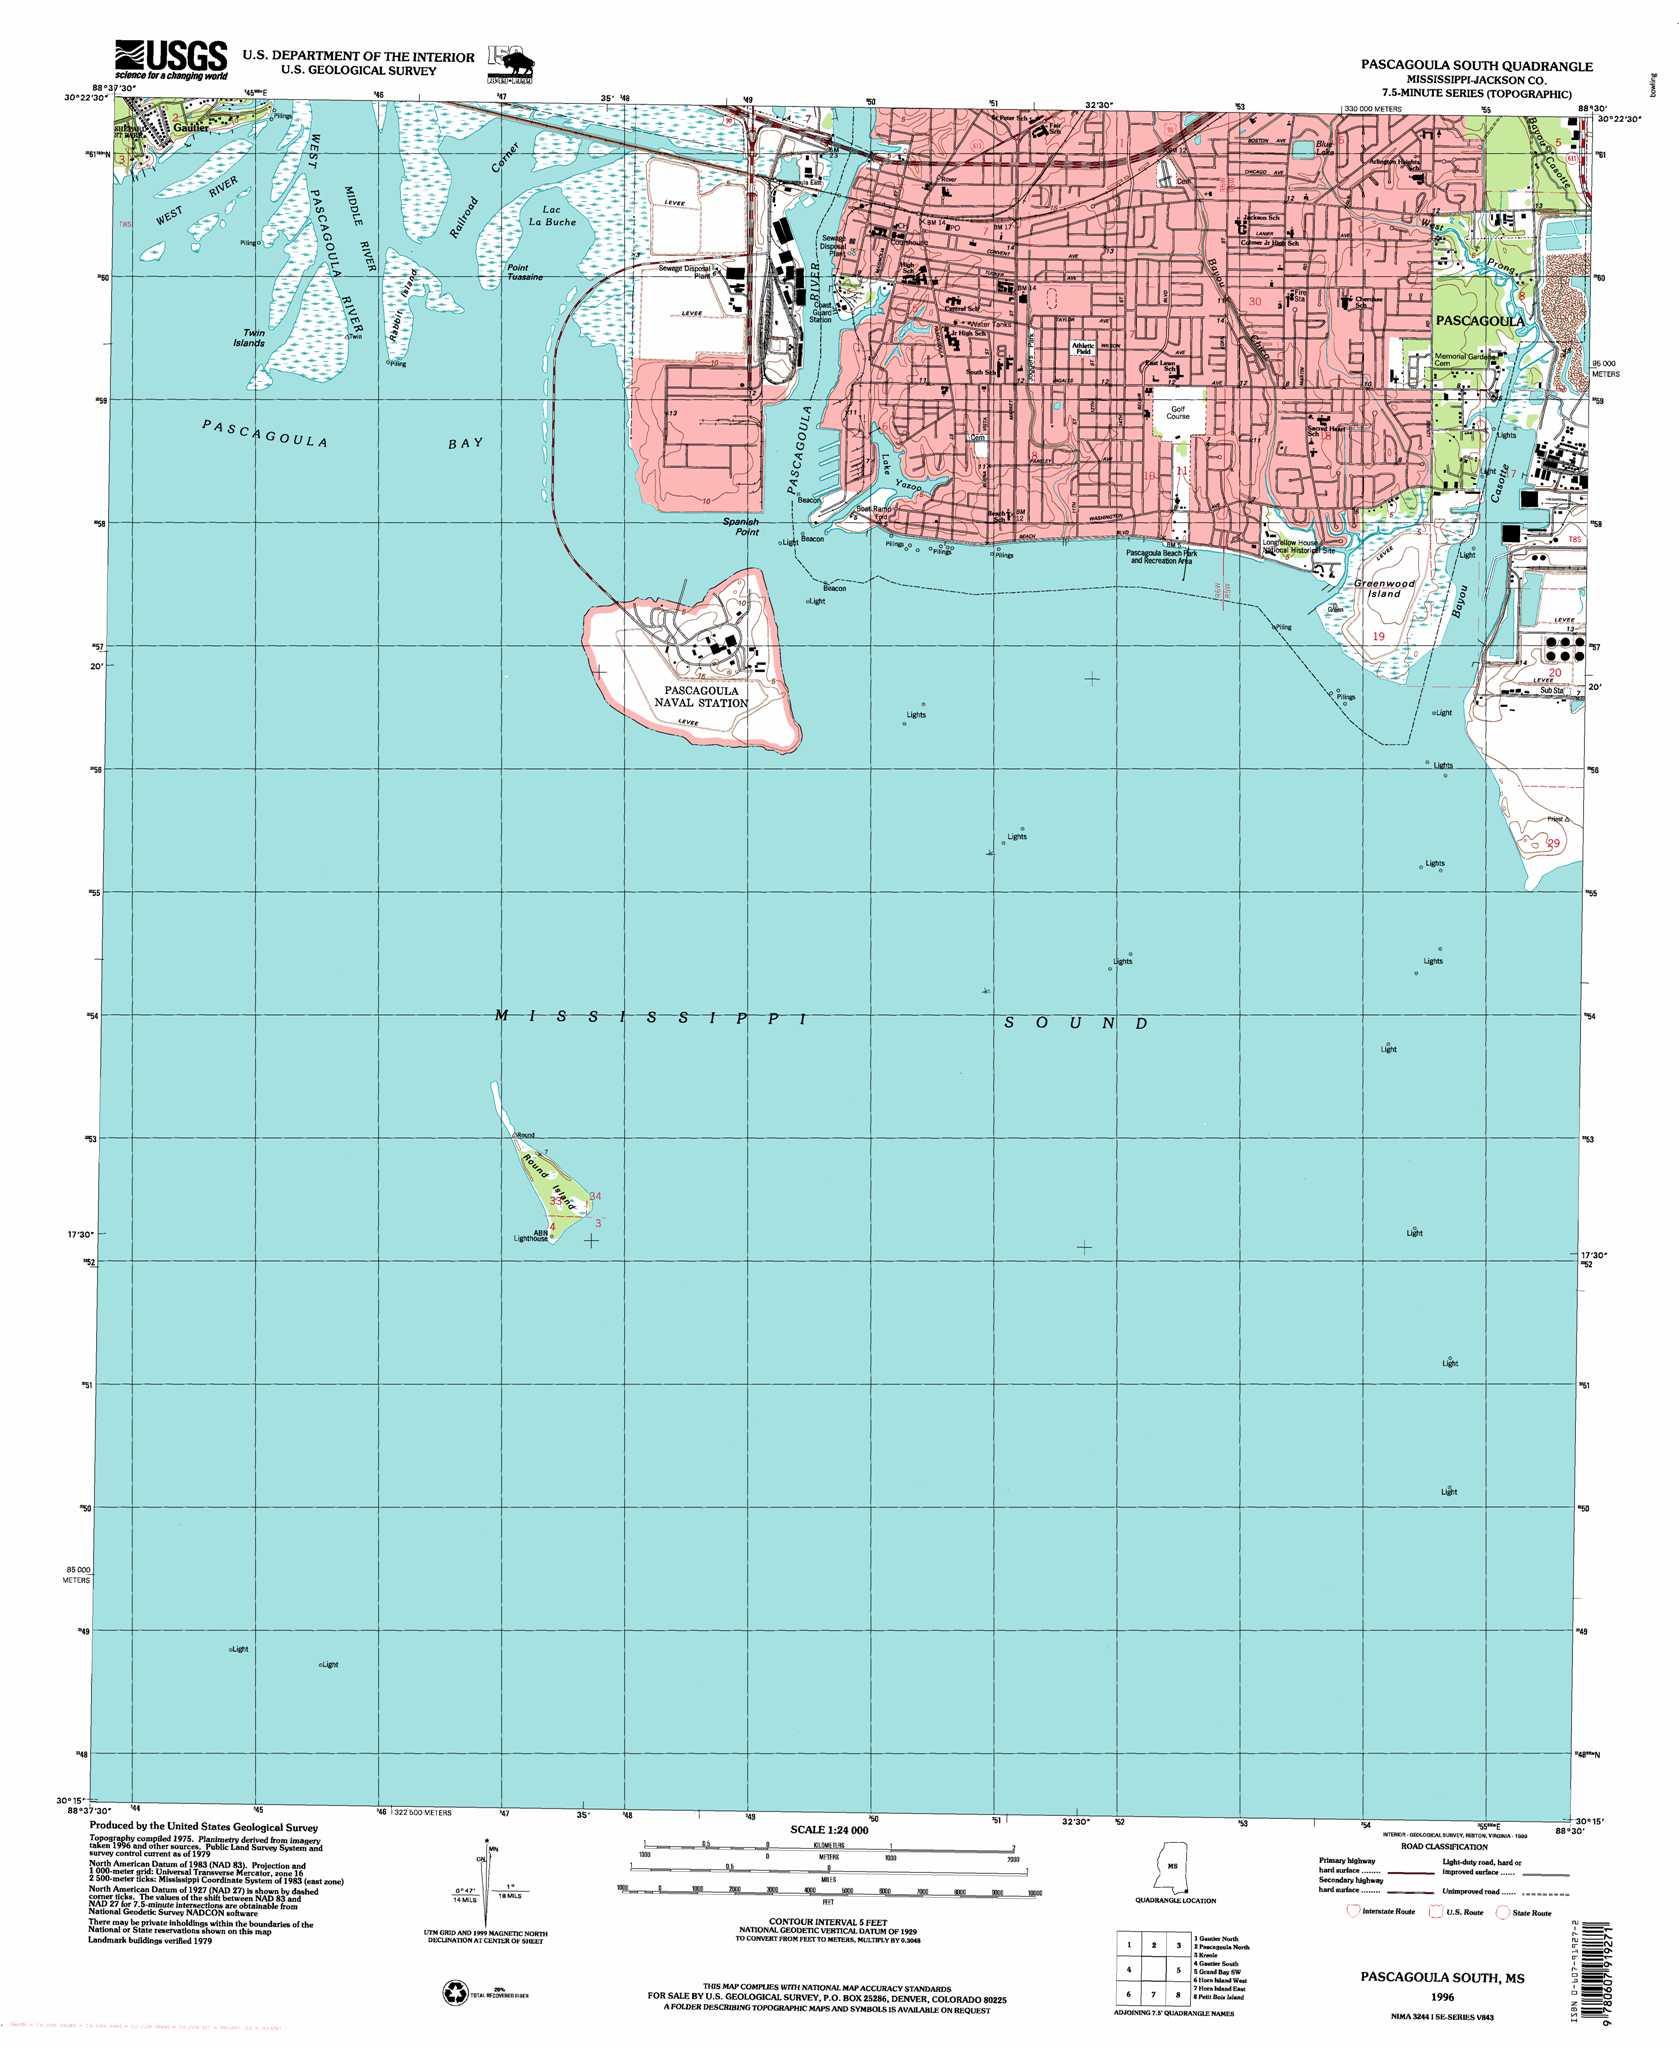 Pascagoula South Topographic Map MS  USGS Topo Quad 30088c5